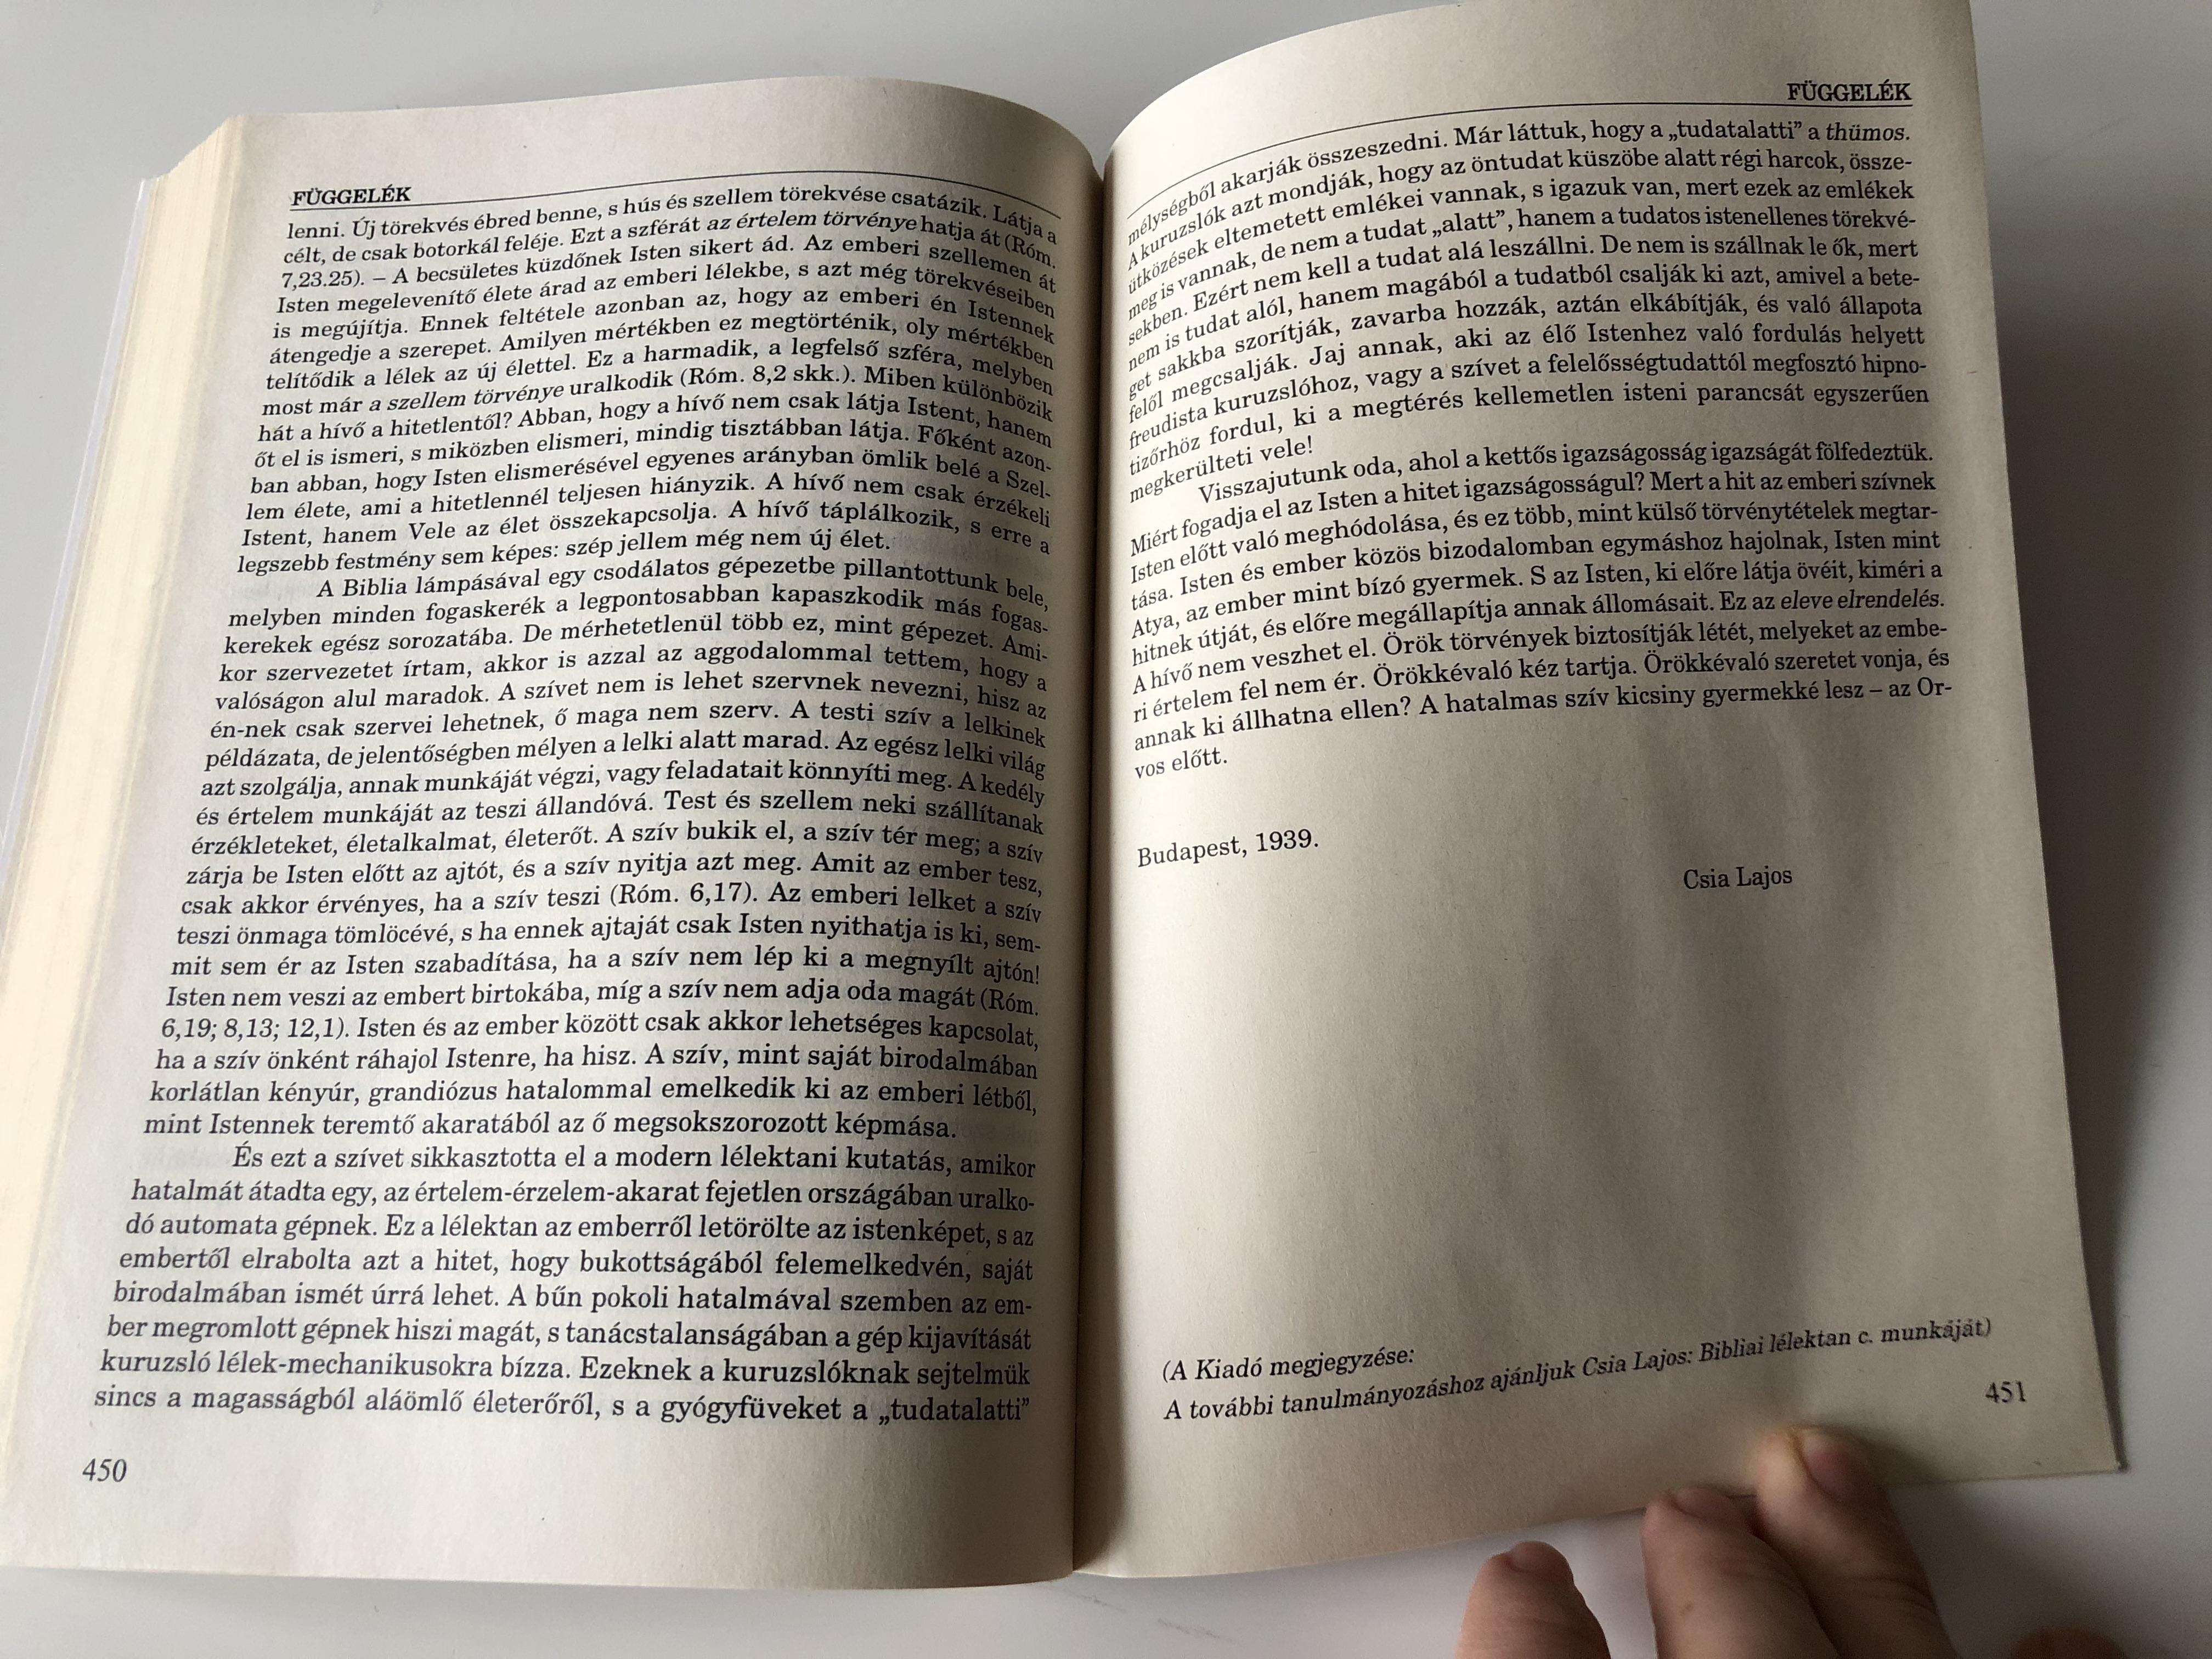 hungarian-new-testament-csia-jsz-vets-g-csia-lajos-fordit-sa-szerint-paperback-1997-3rd-edition-14-.jpg